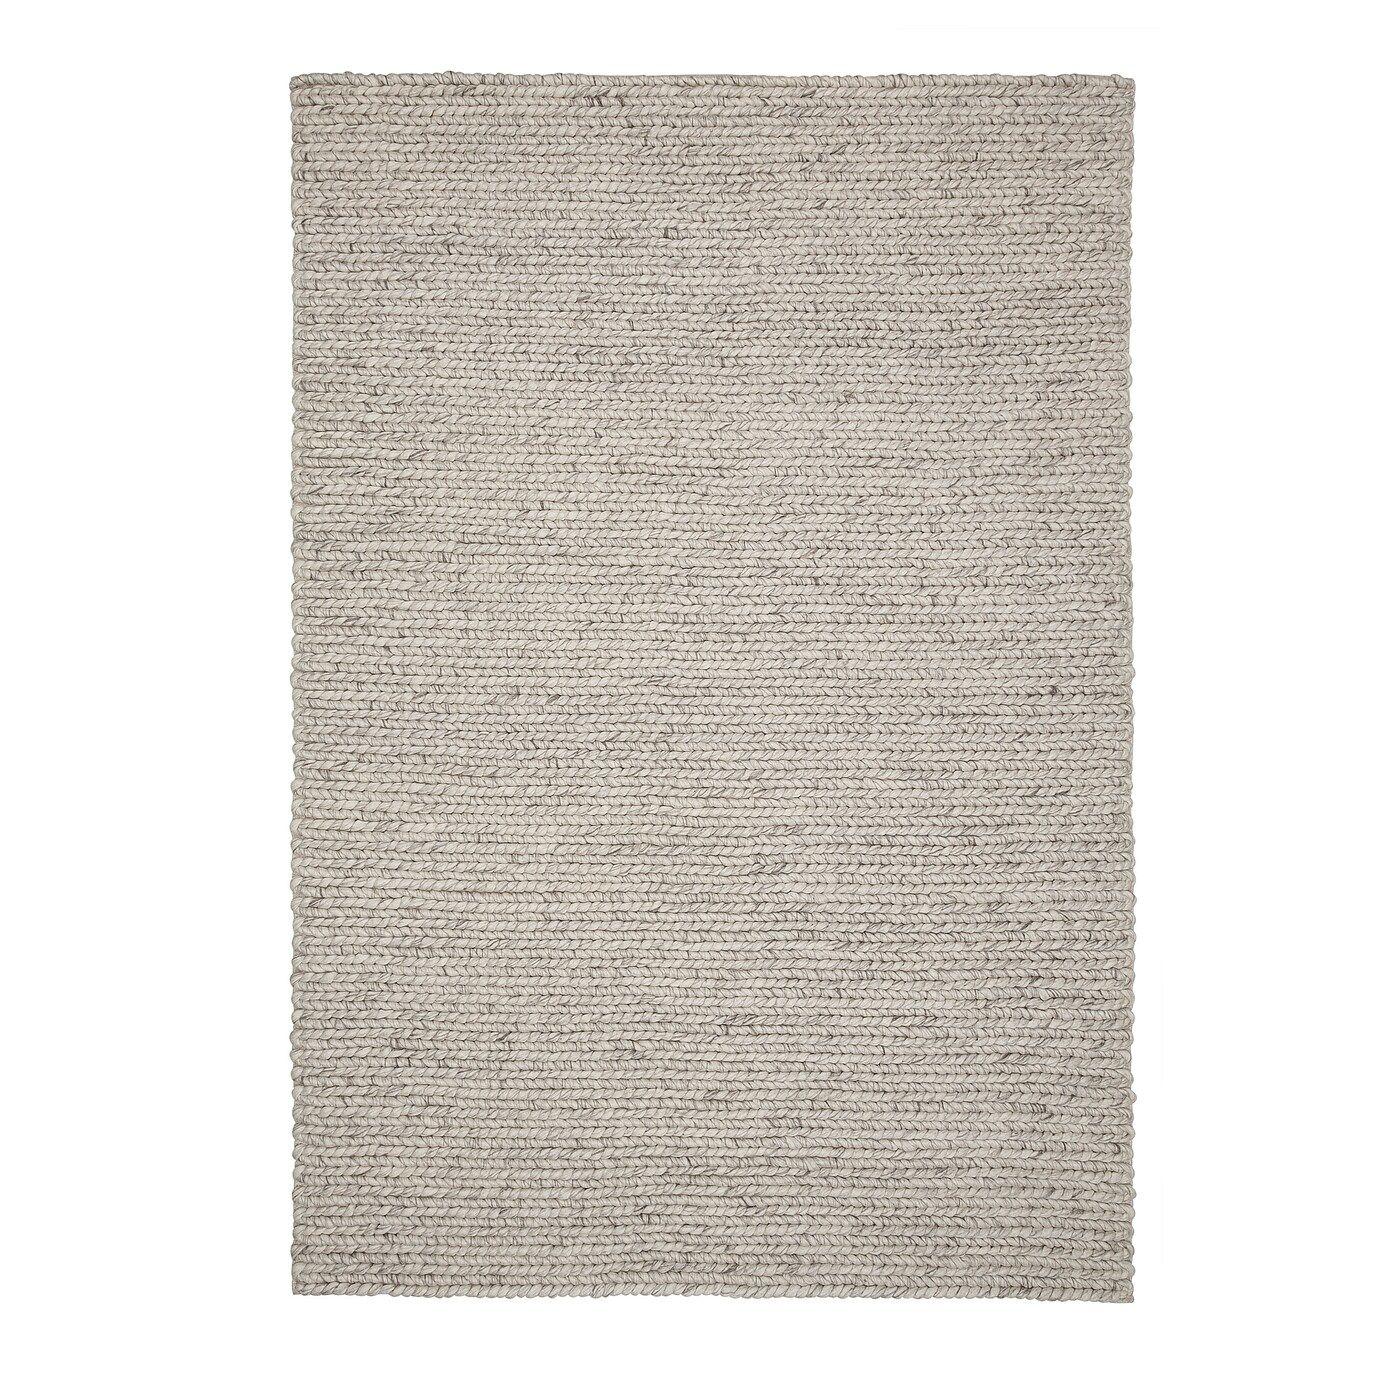 Hjortsvang Rug Handmade Off White Ikea Handmade Rugs Rugs How To Clean Carpet